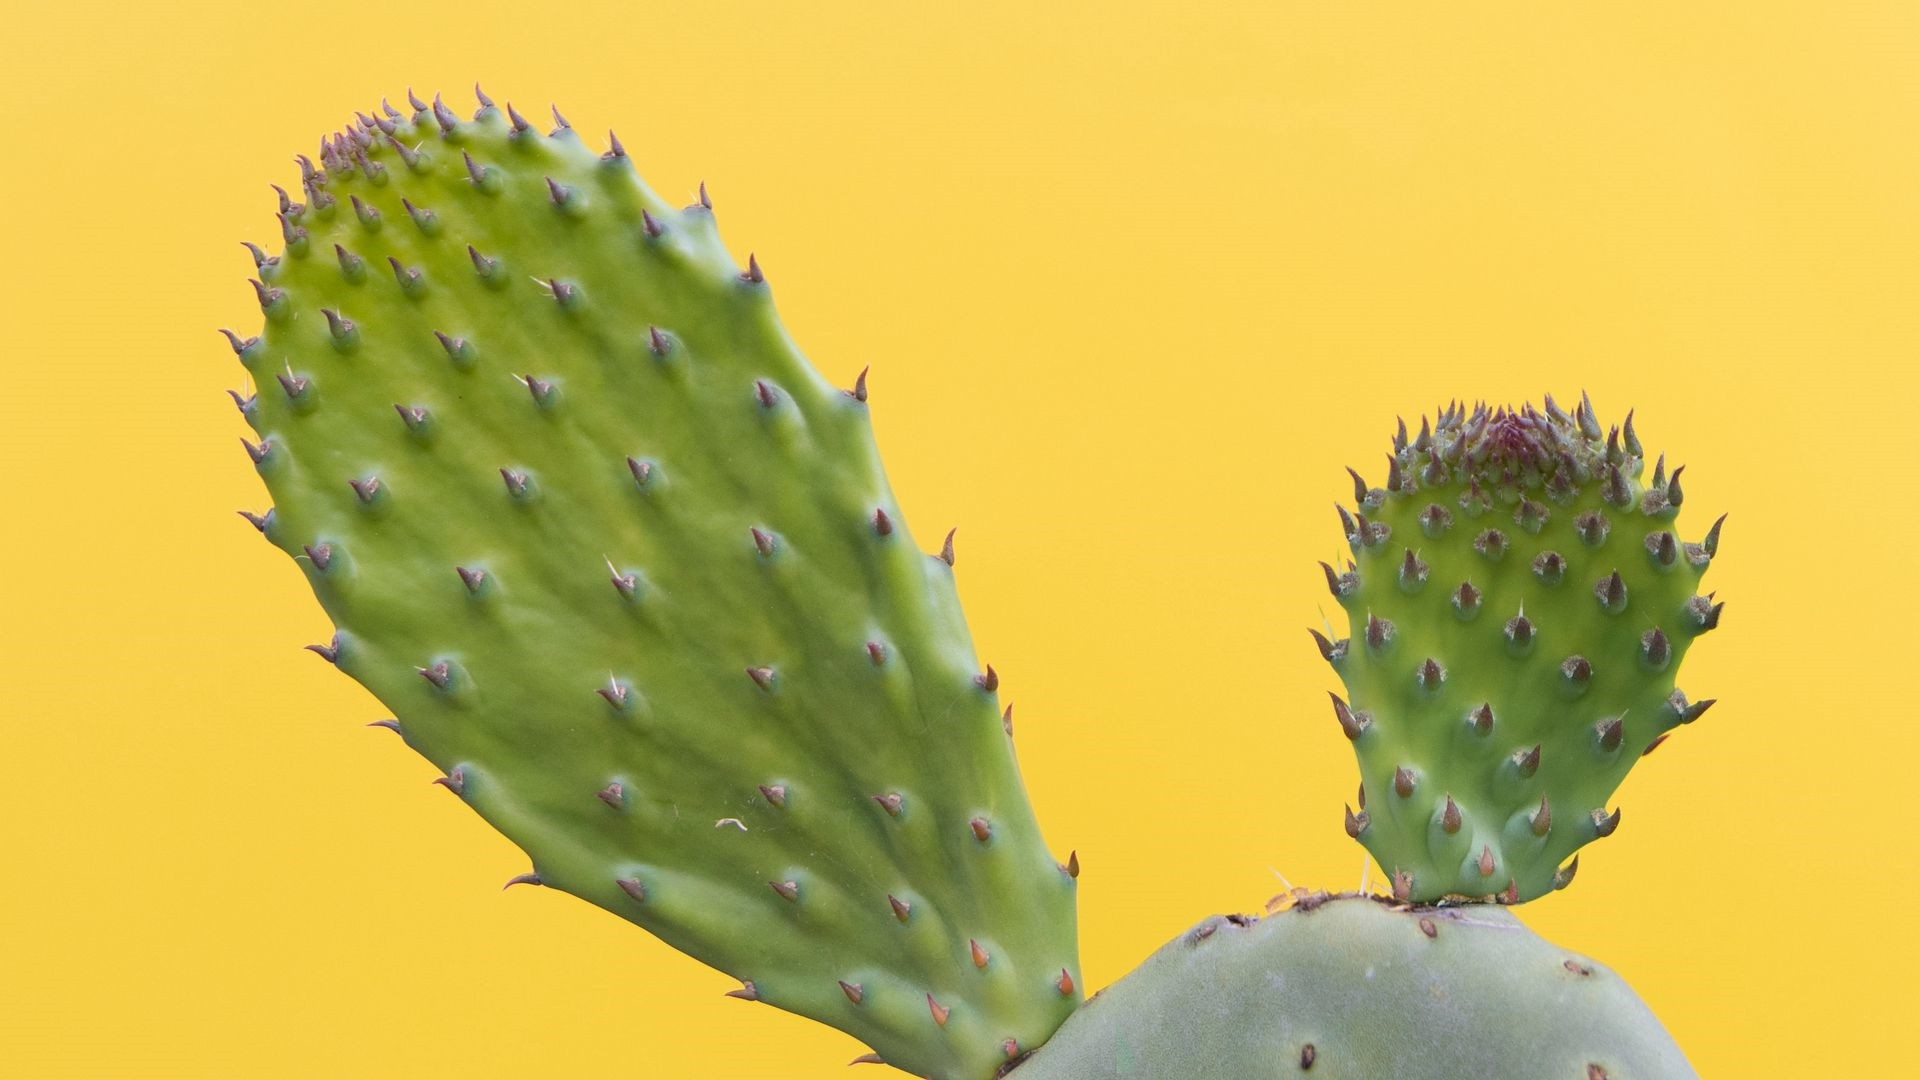 Cactus Minimalist wallpaper photo hd